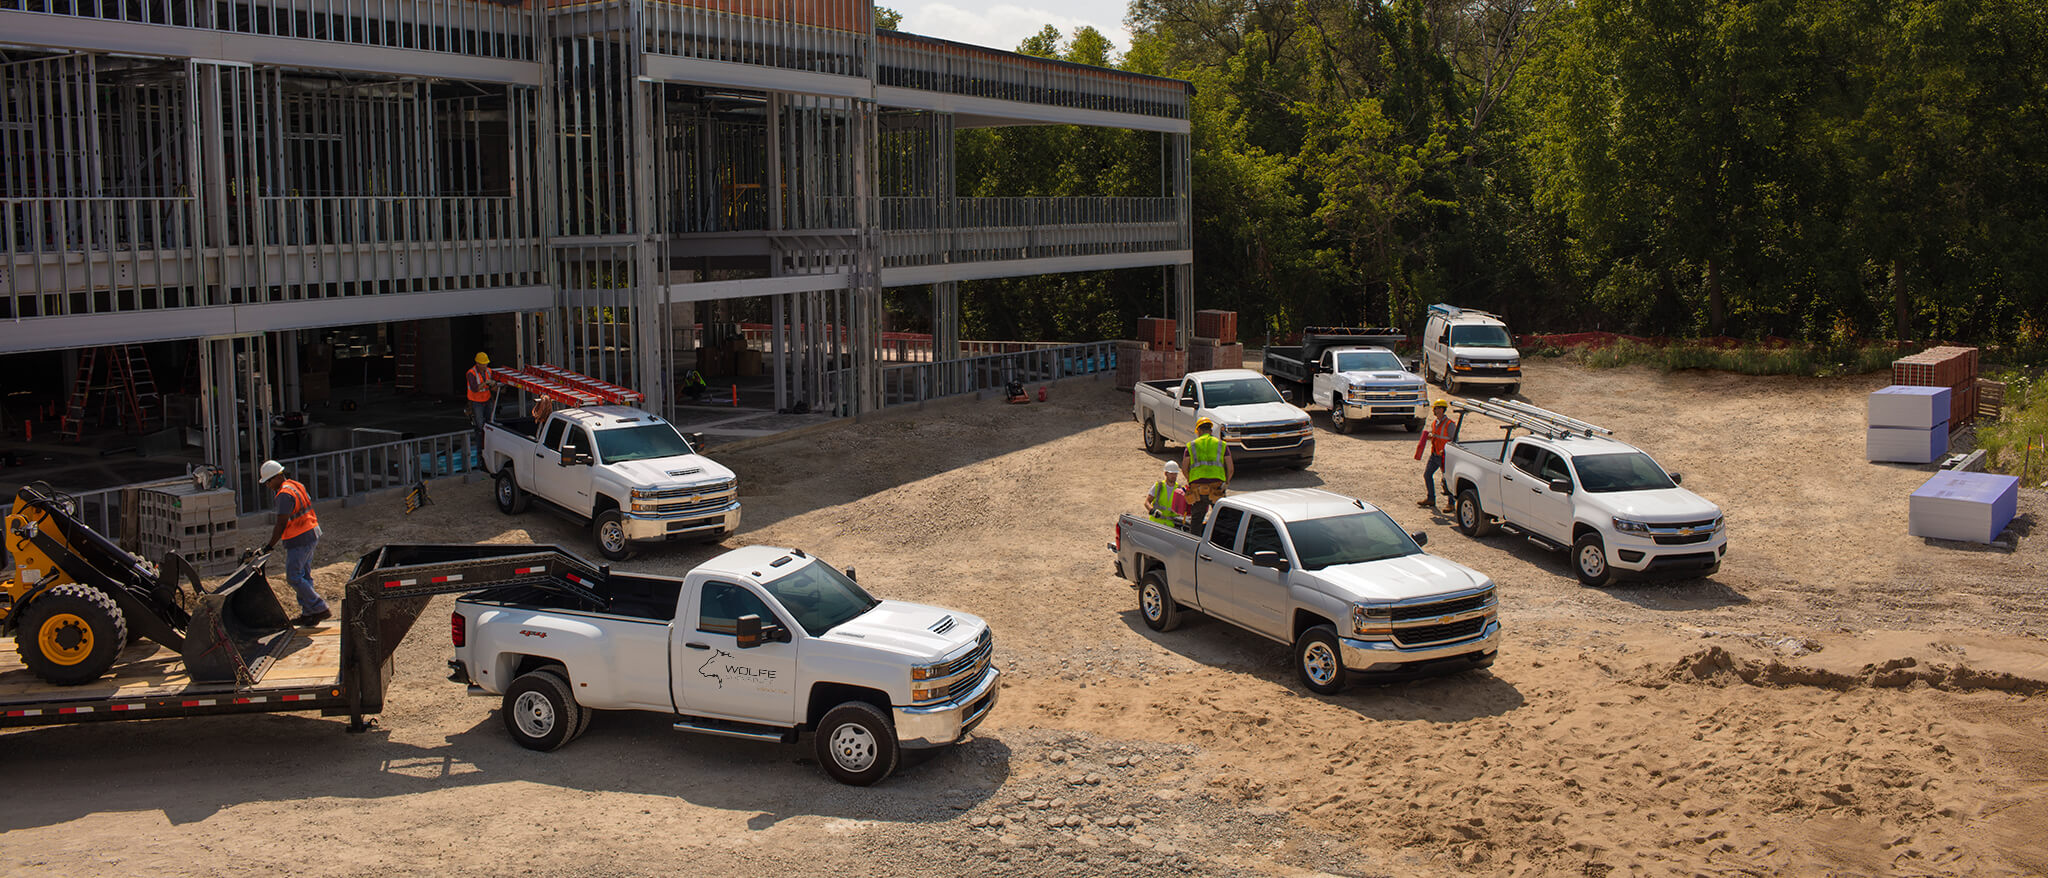 The Chevy Farm Fleet Truck